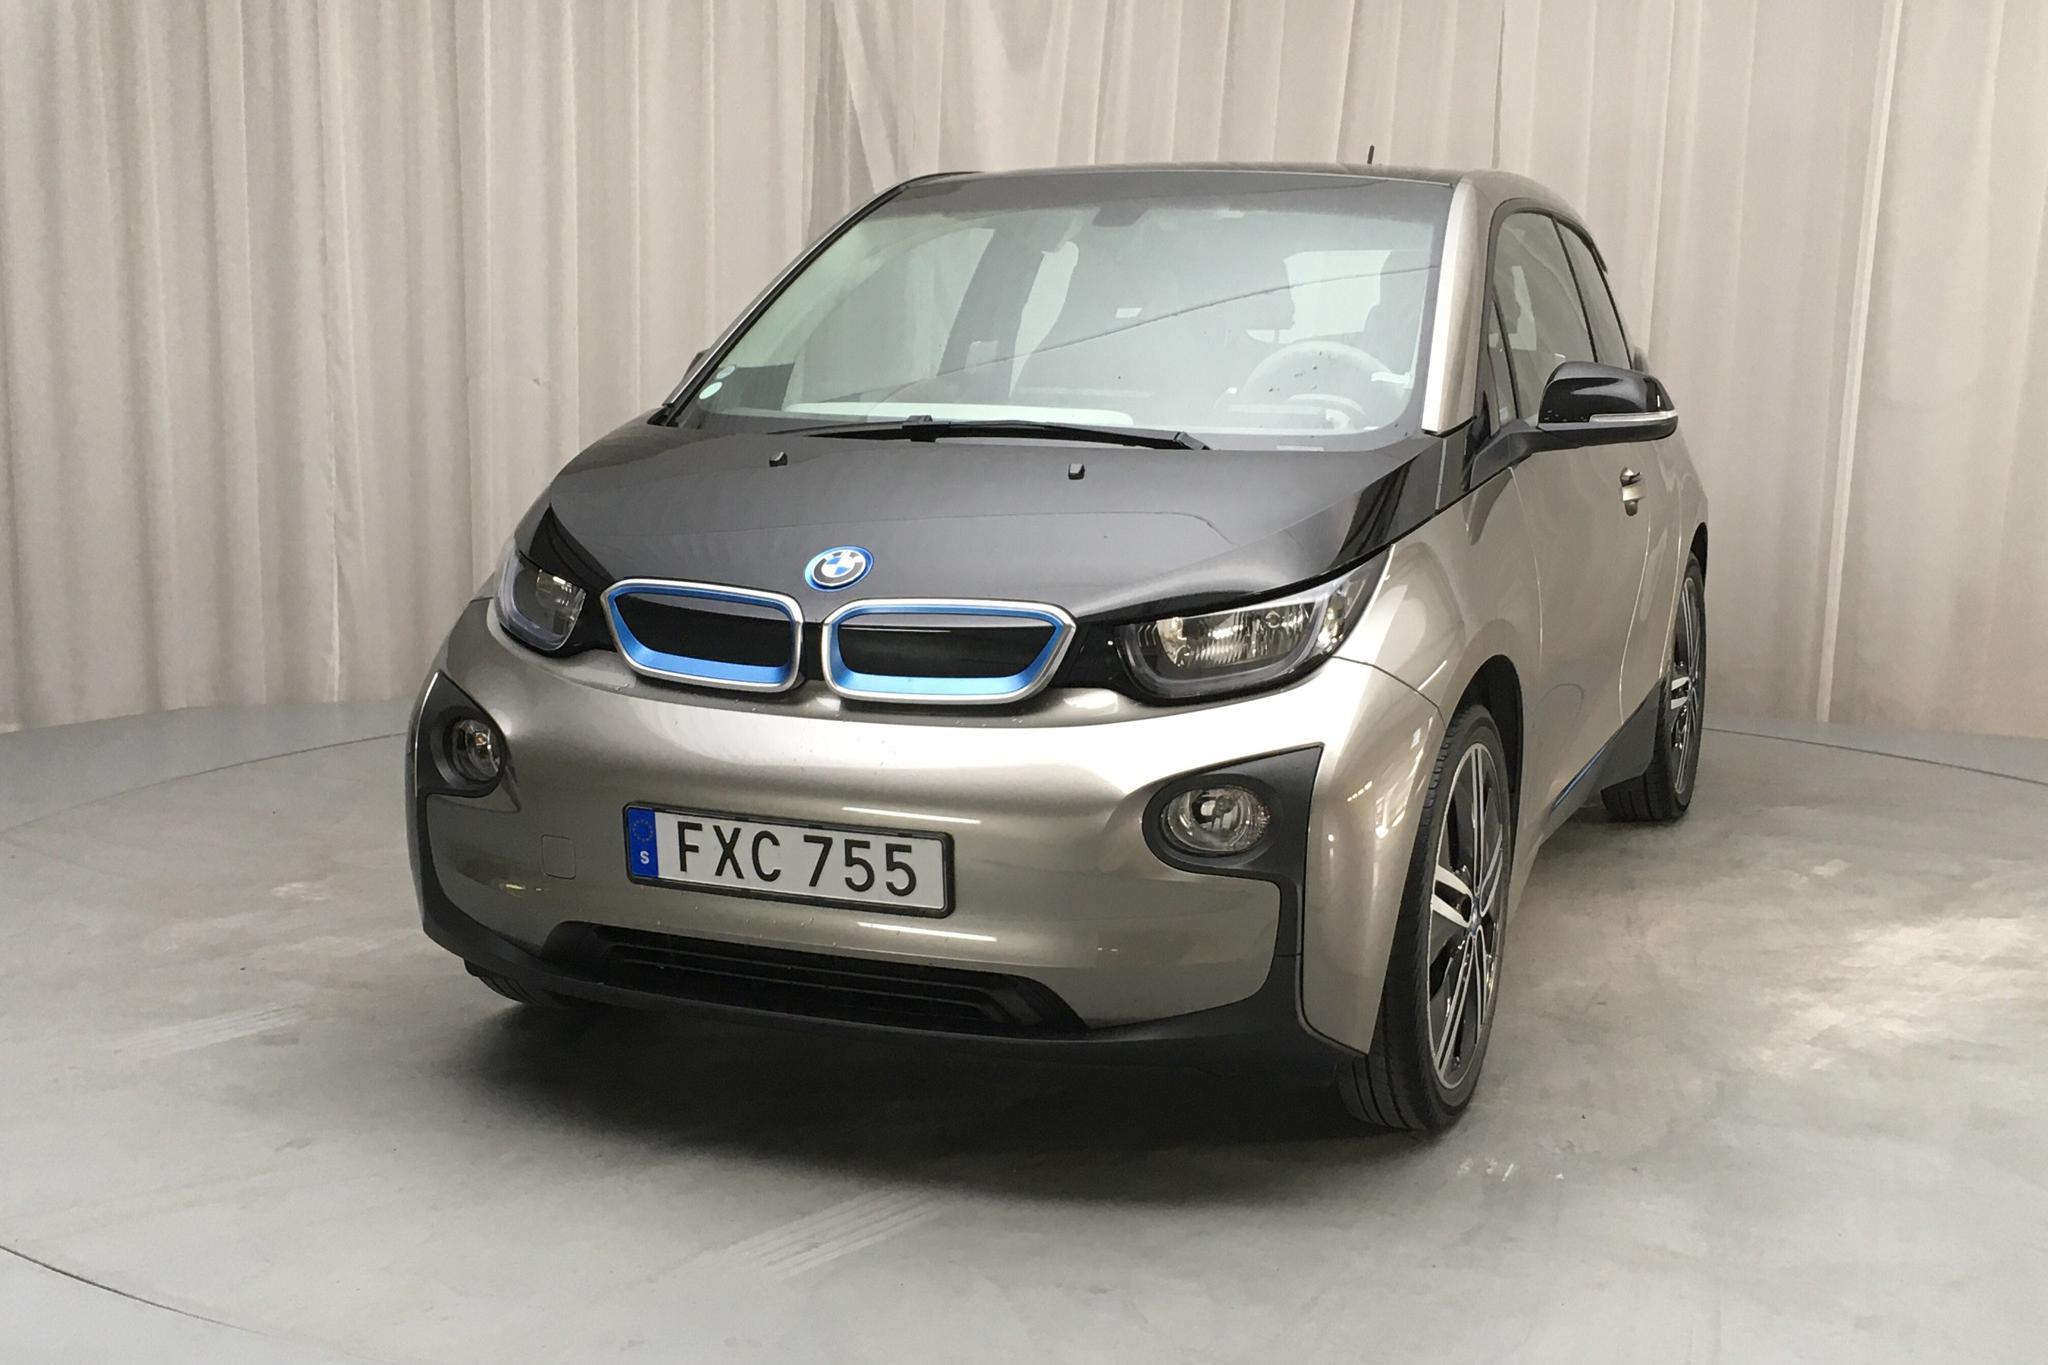 BMW i3 60Ah REX, I01 (170hk) - 5 838 mil - Automat - silver - 2016